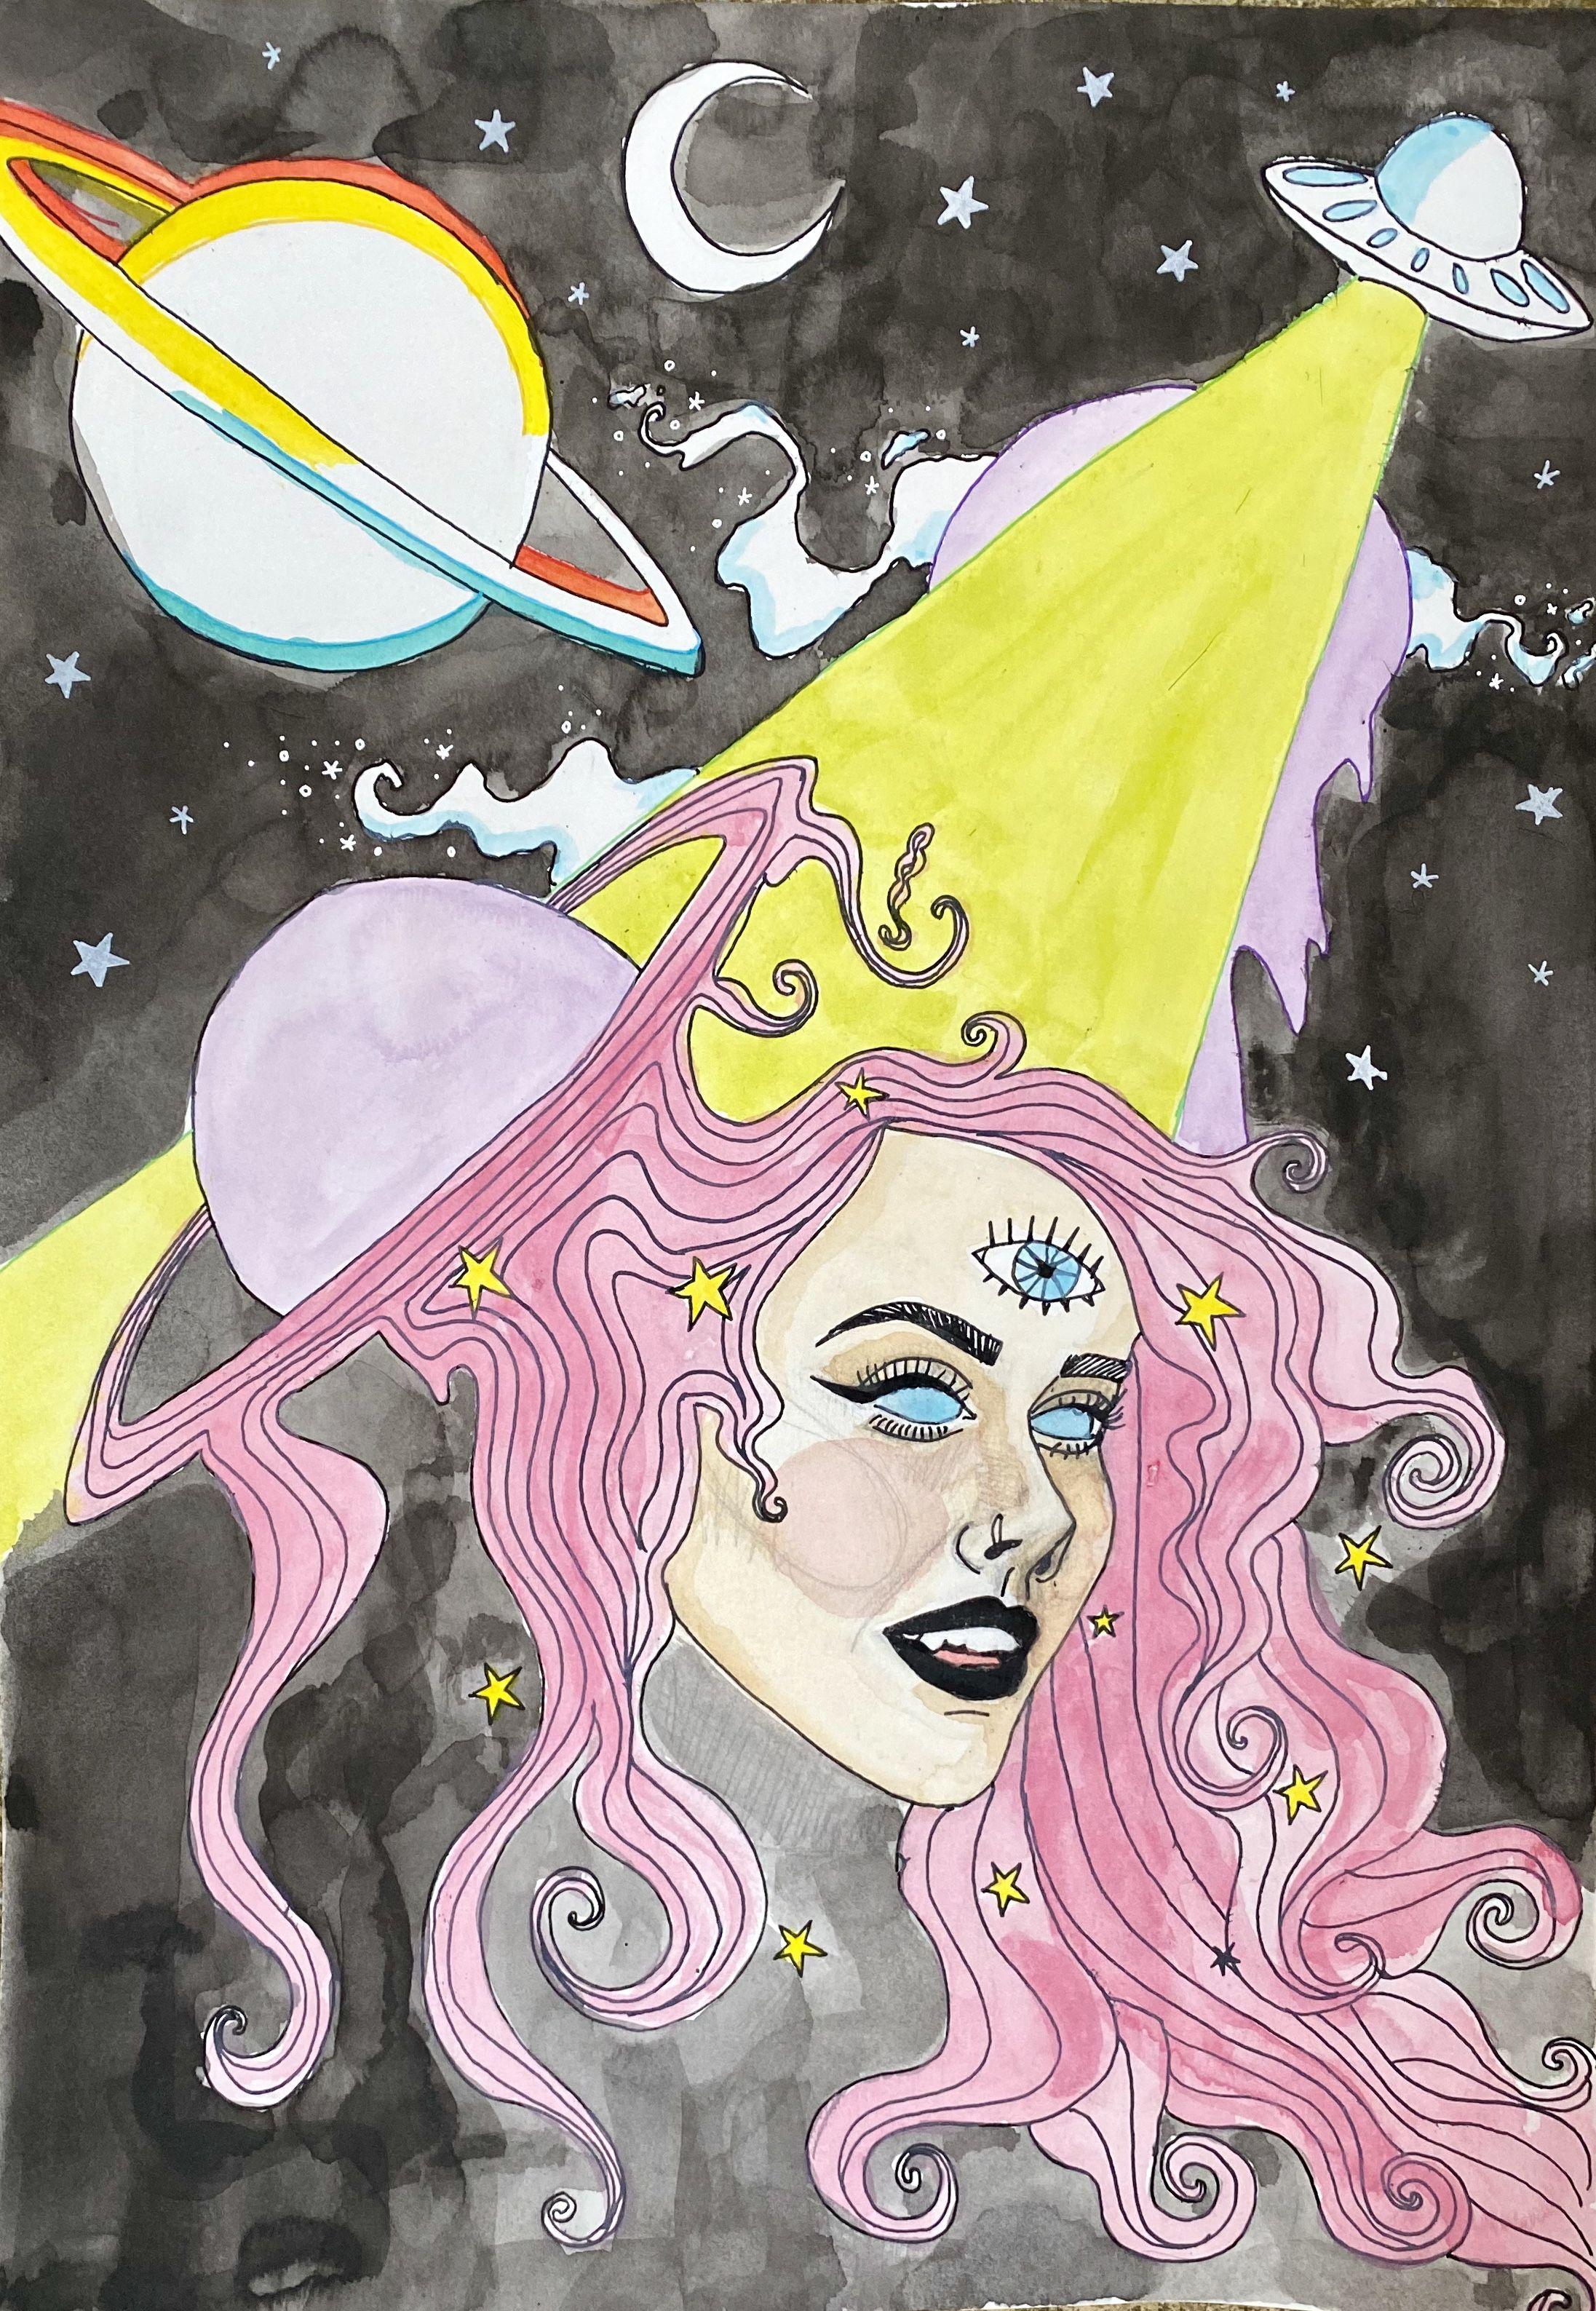 Trippy self-portrait in 2020 | Planet painting, Portrait